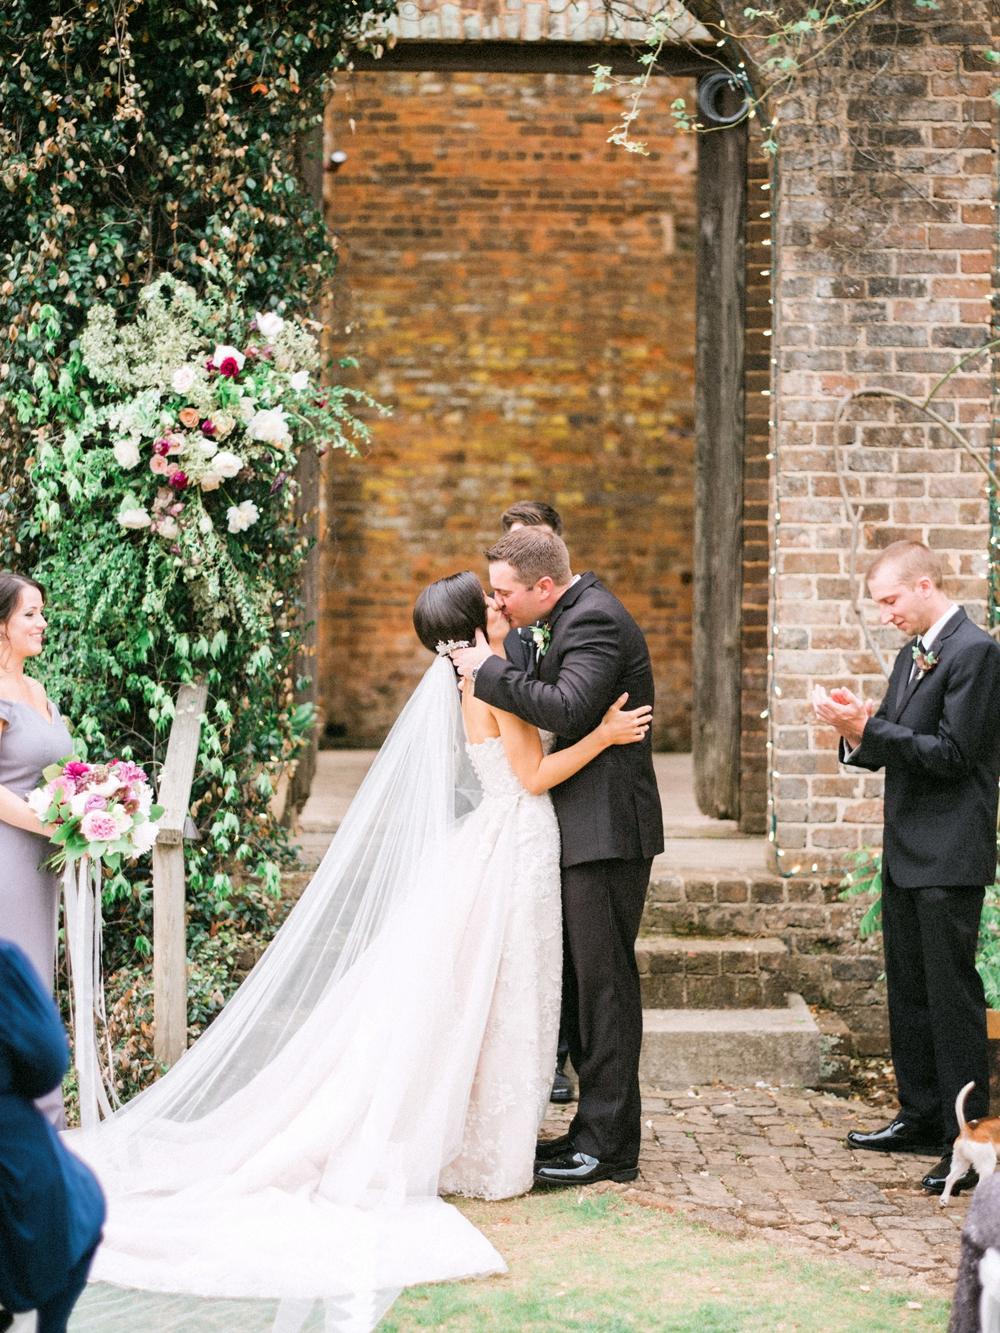 Barnsley Planation Wedding. Georgia Wedding Photographer_0030.jpg